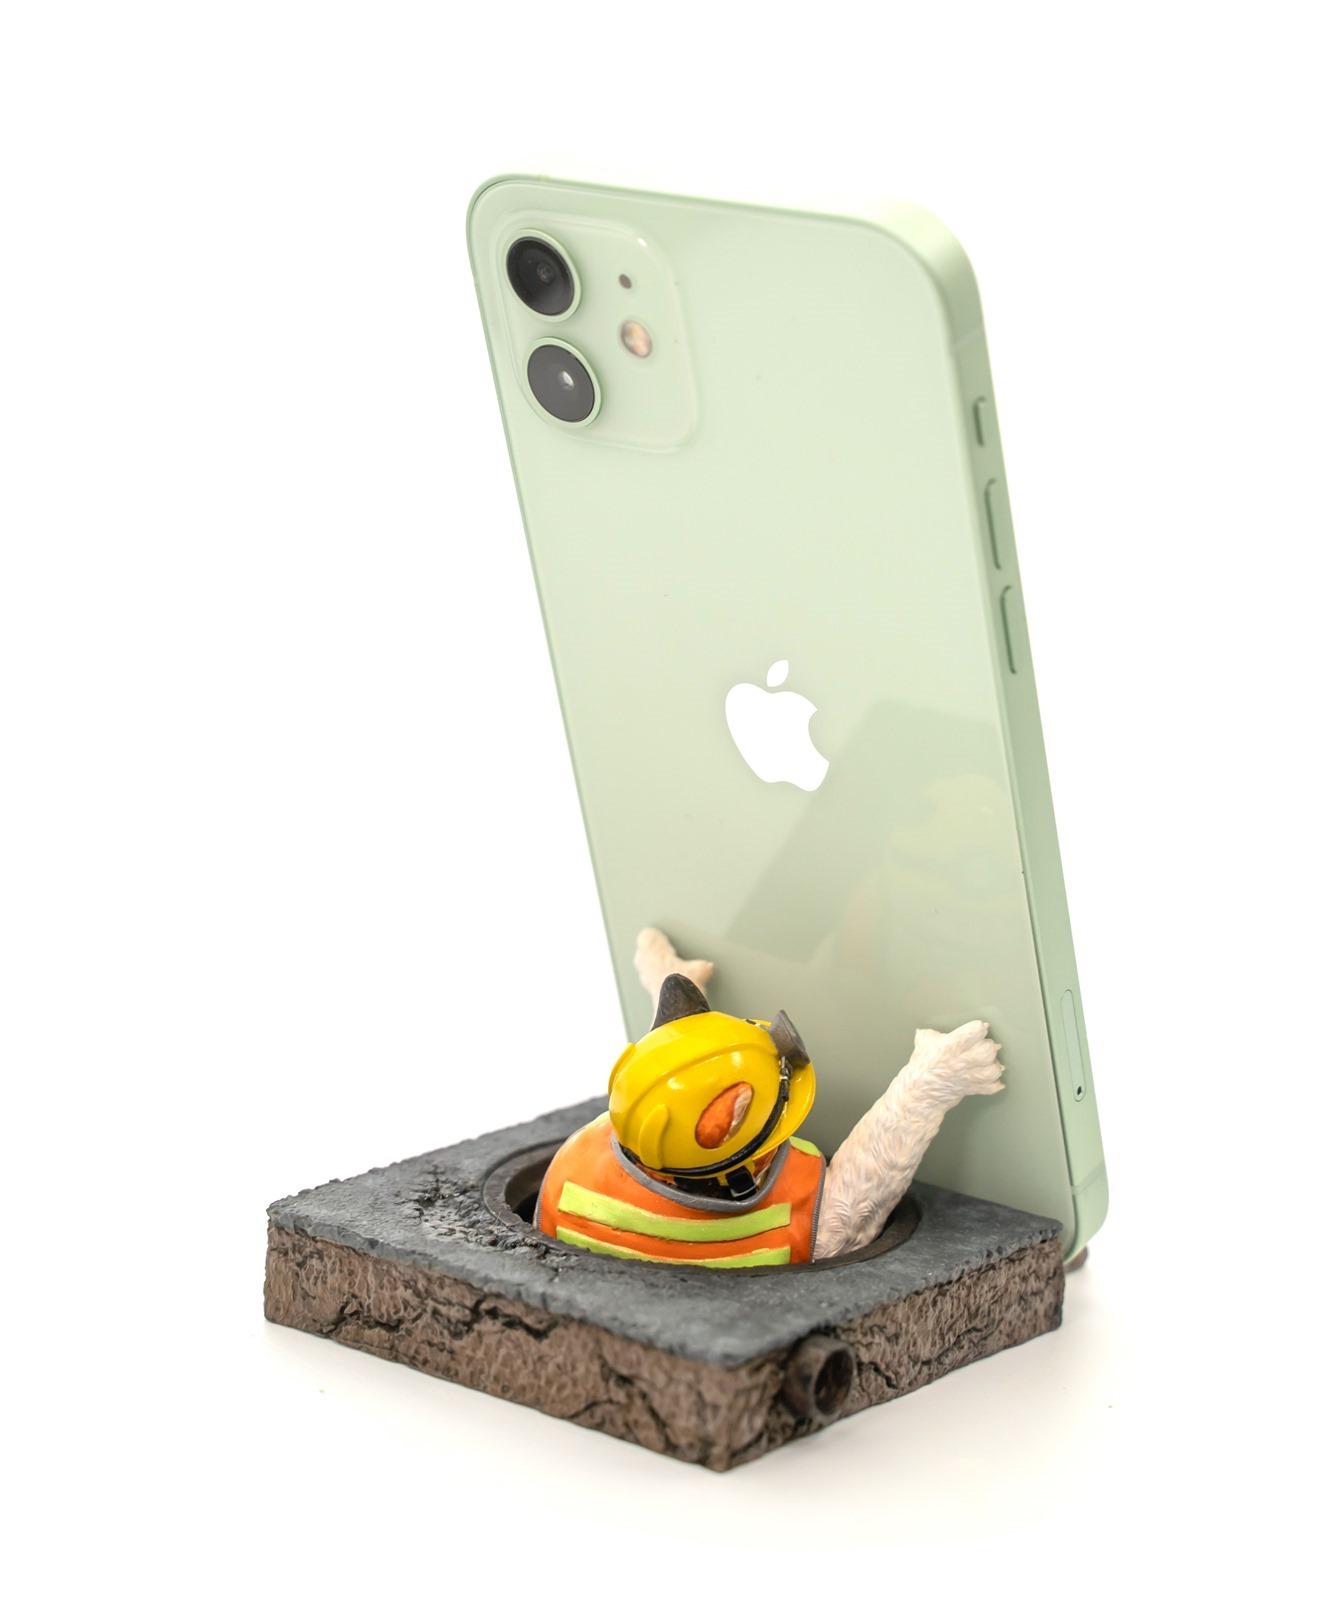 ZFunky Studio 撐得住系列『外送貓手機架』客製版開箱 (黑貓學妹 & 三花社長) + 配合 iPhone 12 / iPhone 12 Pro / iPhone 12 Mini / iPhone 12 Pro Max @3C 達人廖阿輝